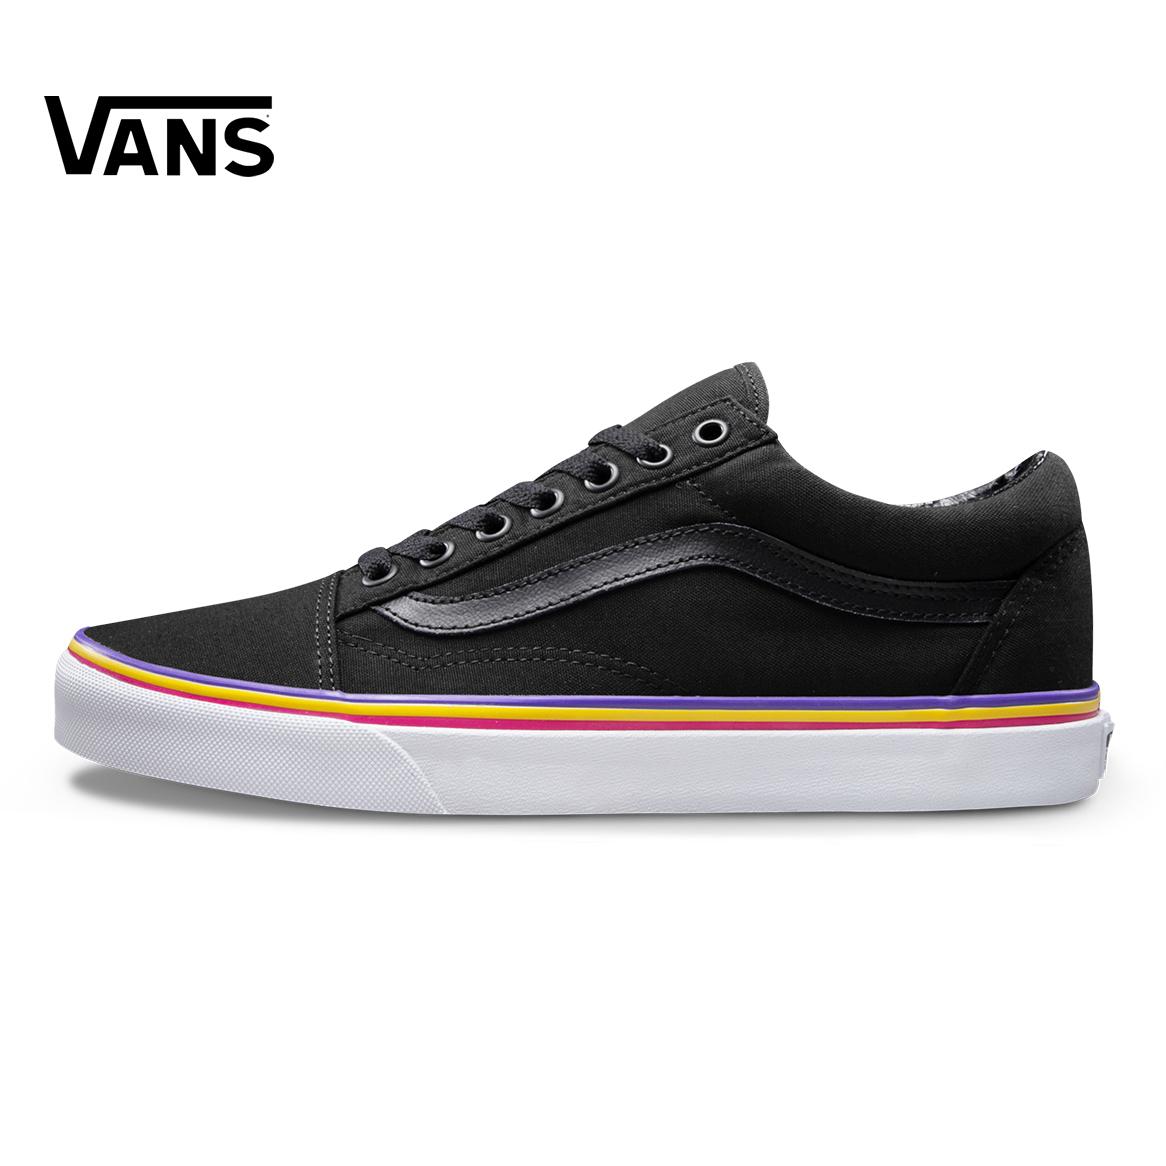 Vans 范斯官方男女款OLD SKOOL板鞋|VN0A38G1MWE-MWF